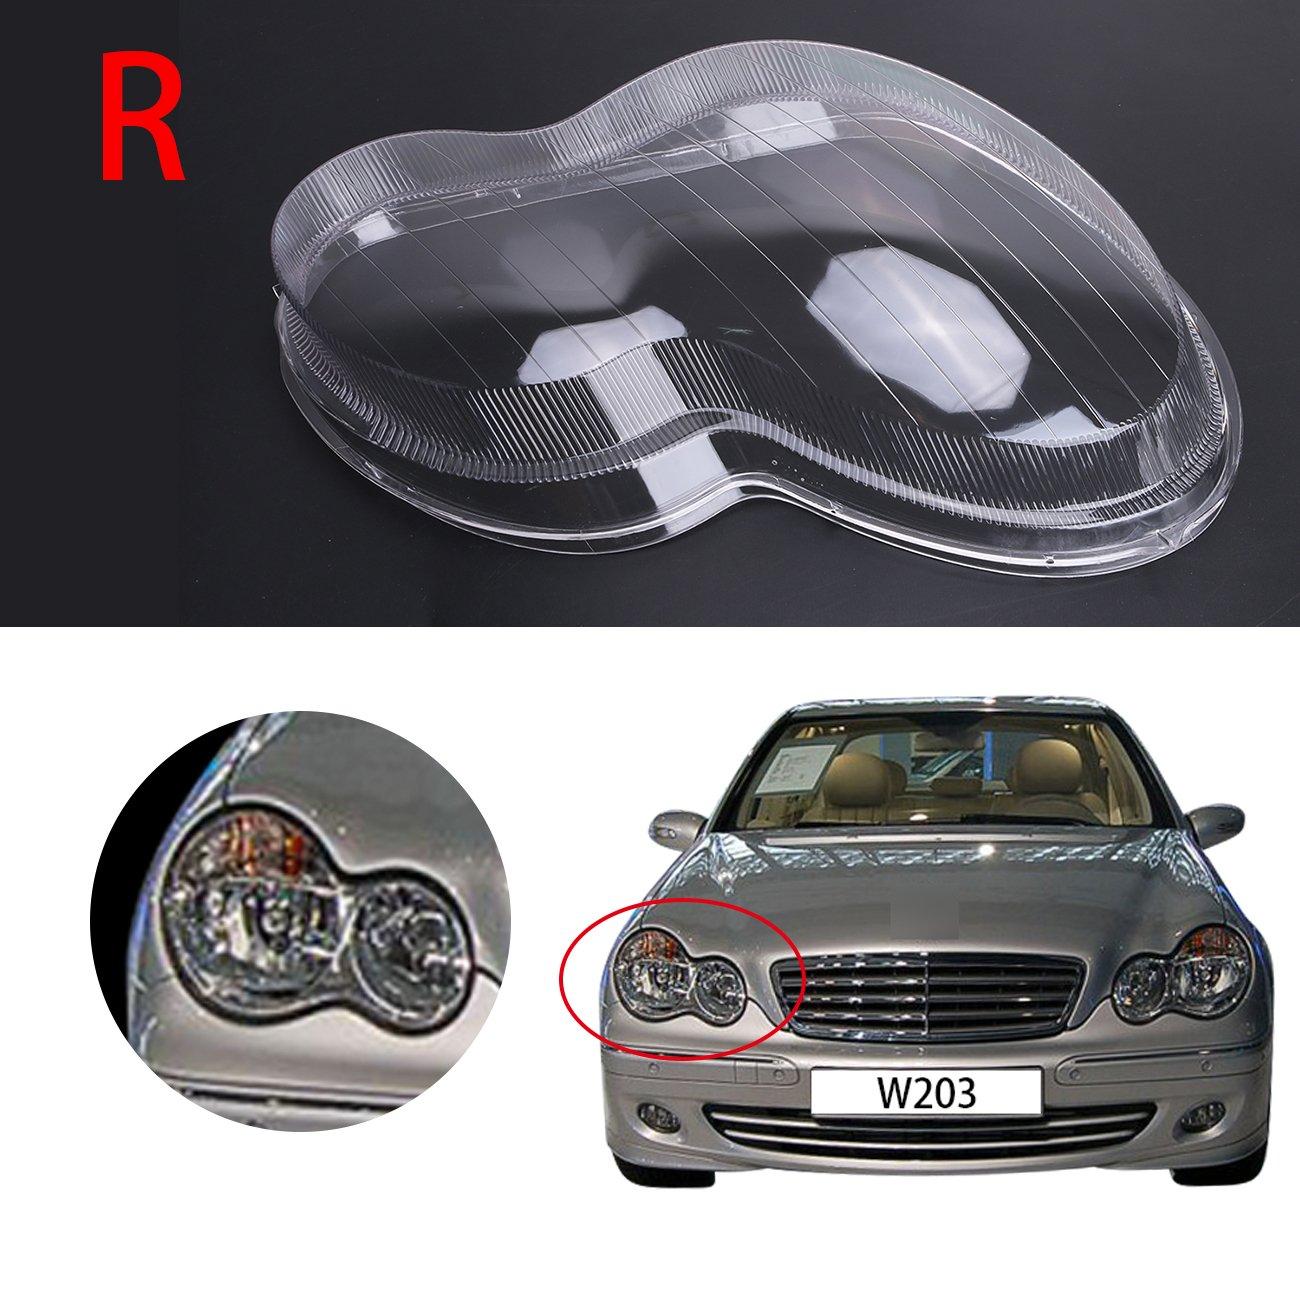 General Mega (Right: Passenger Side) Headlight Lens Plastic Shell Cover For Mercedes Benz W203 C-Class C230 C280 C350 2001-2007 Polycarbonate